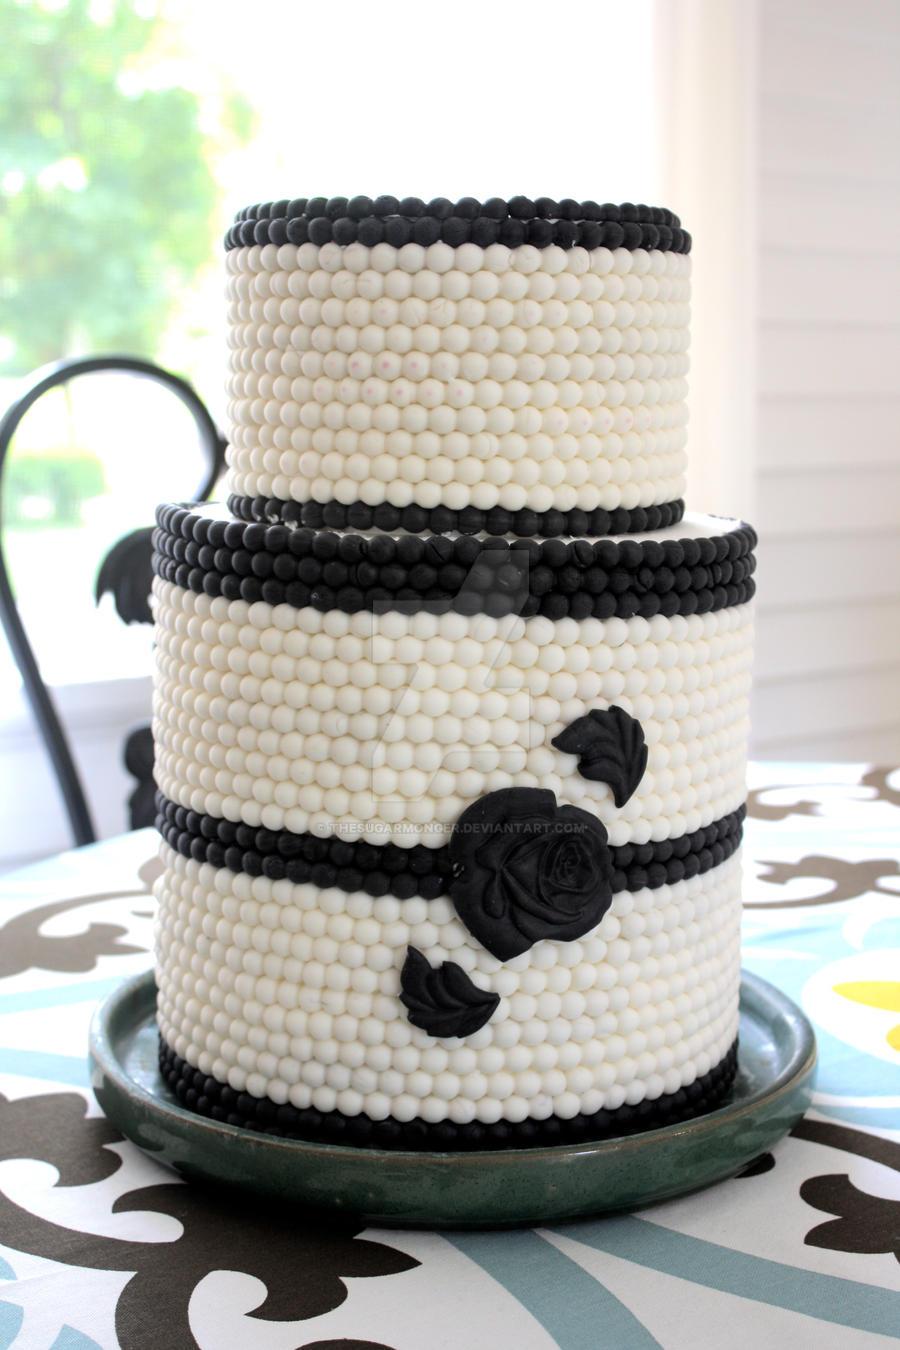 Navy Blue White Wedding Cake by theSugarmonger on DeviantArt